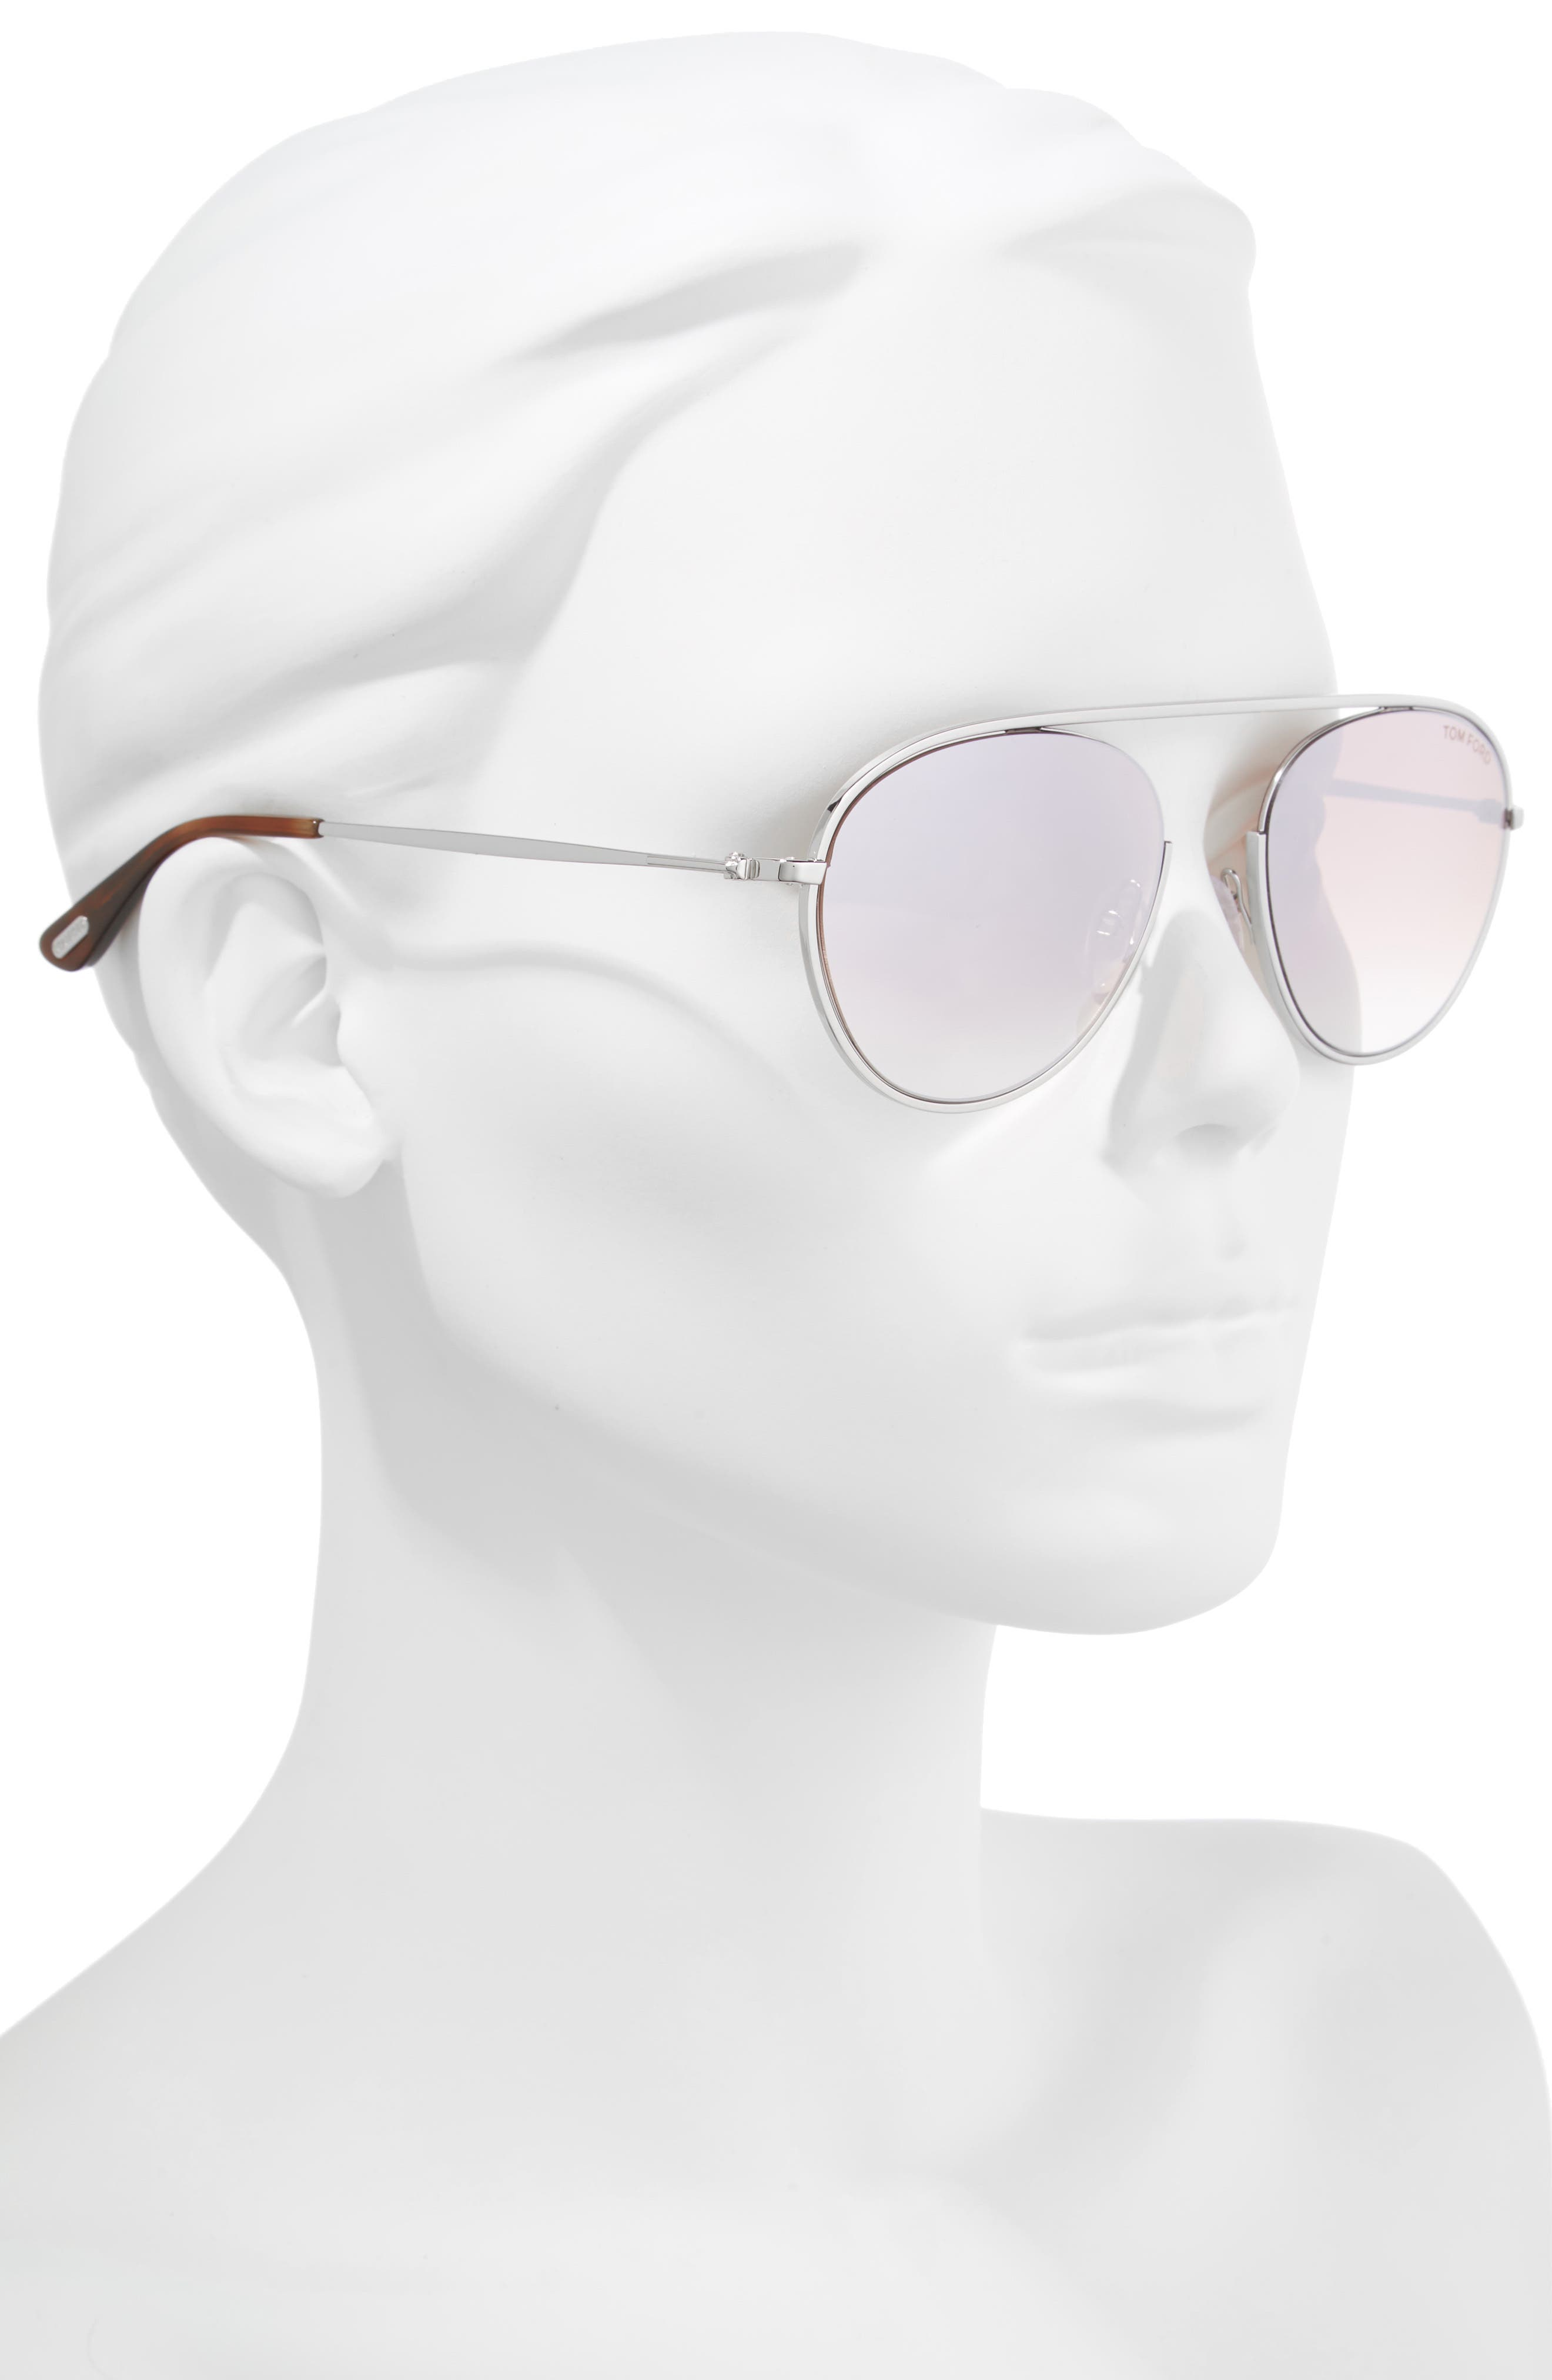 Keith 55mm Metal Aviator Sunglasses,                             Alternate thumbnail 2, color,                             040